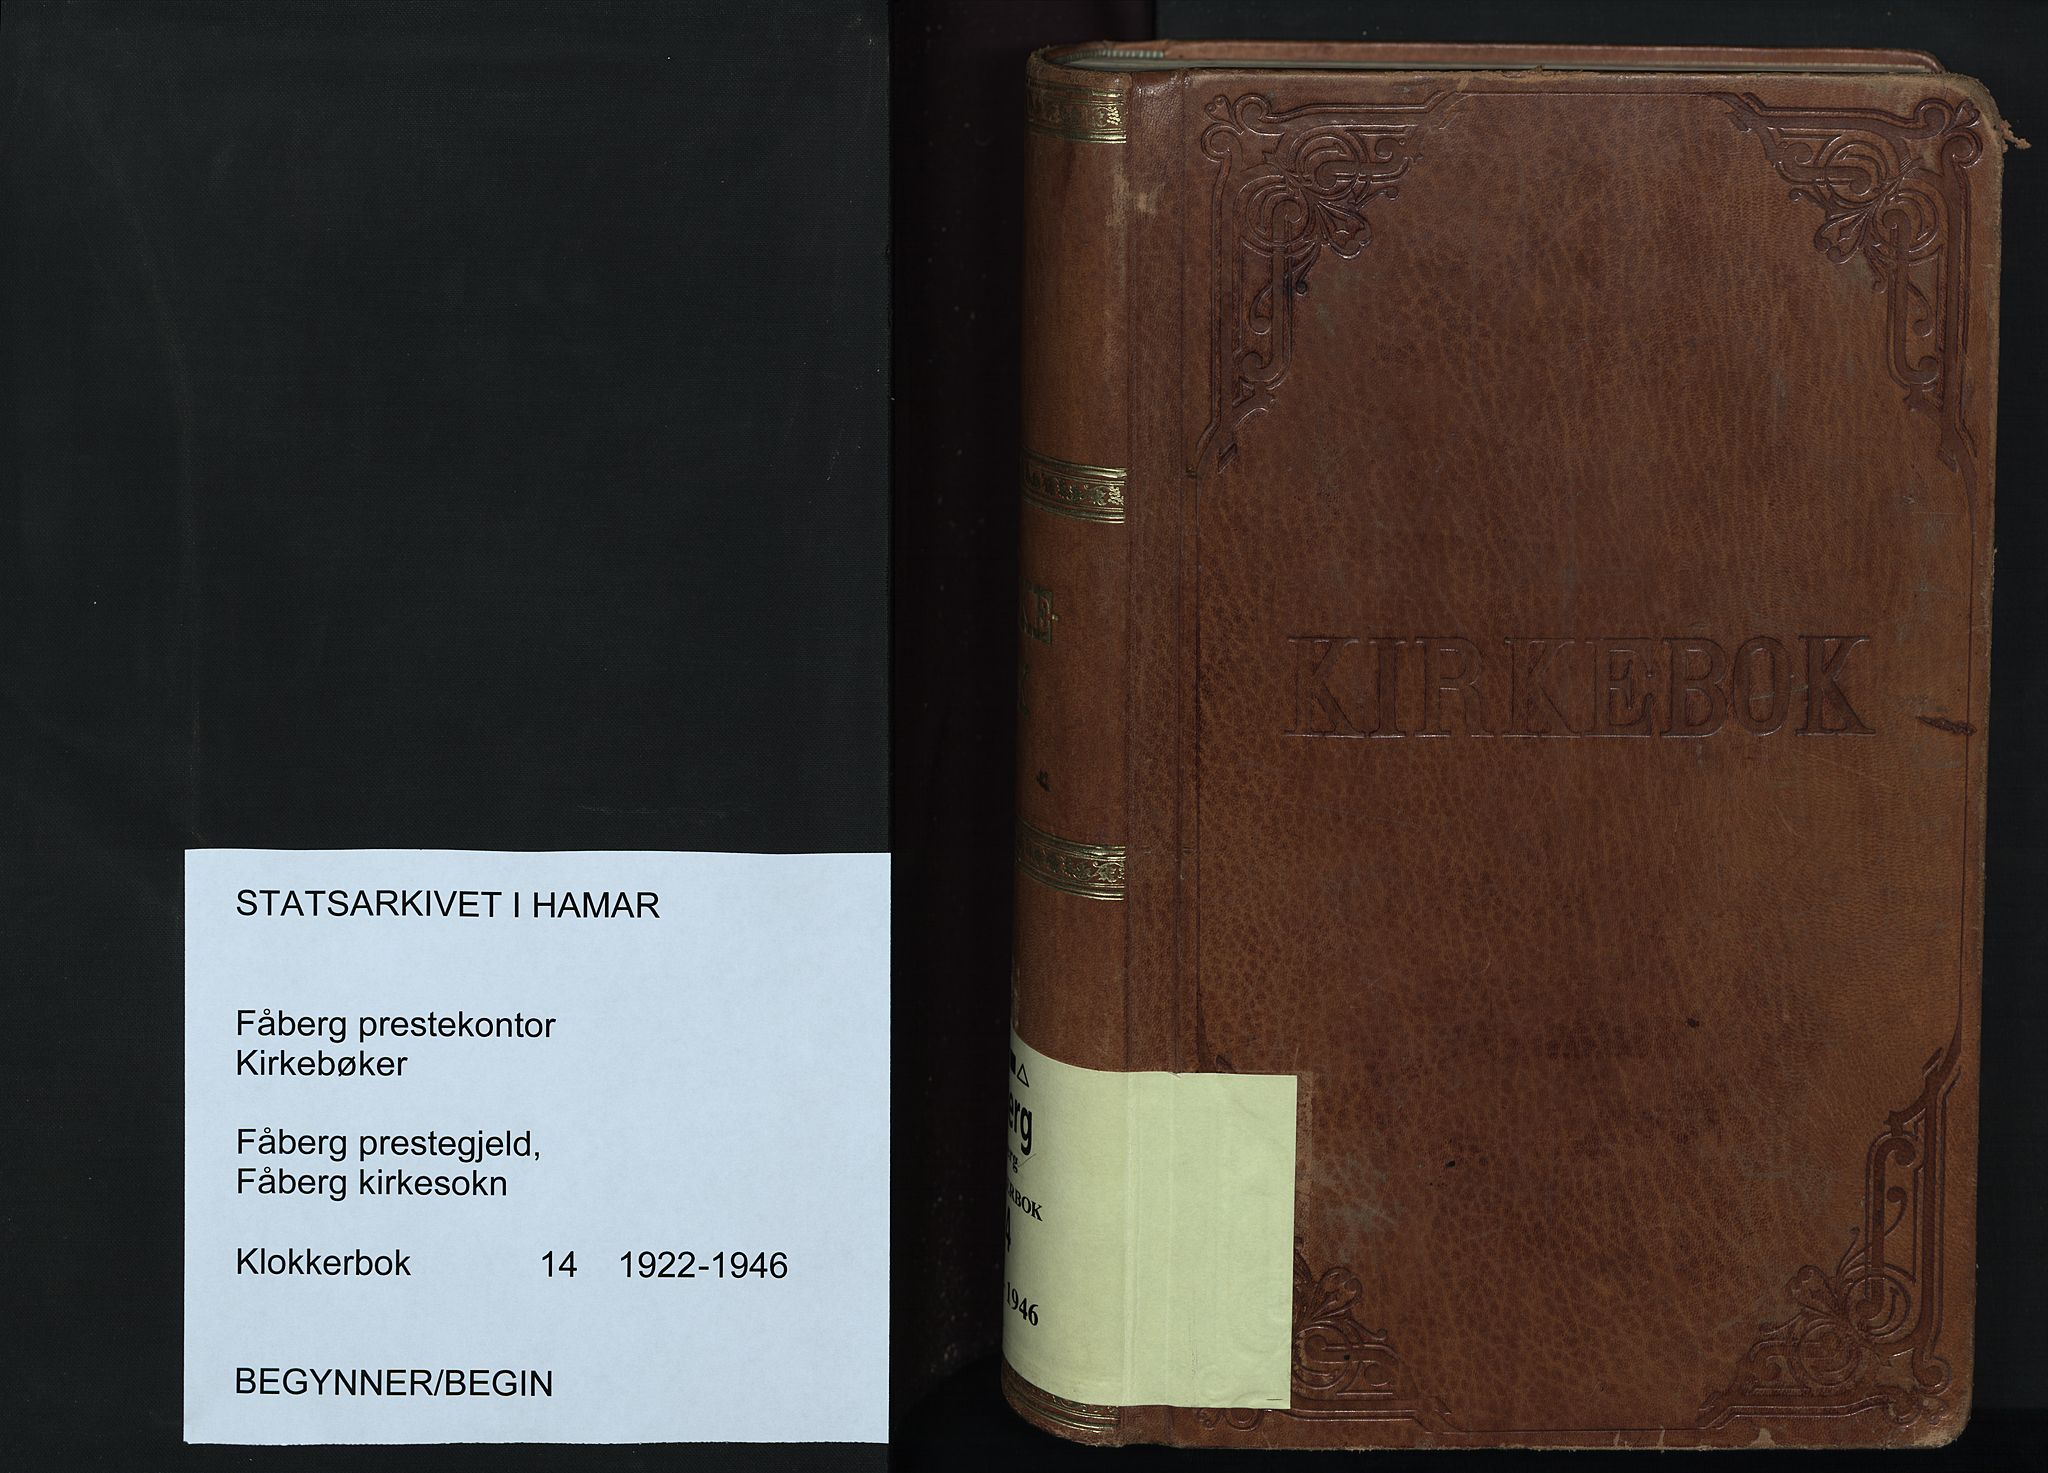 SAH, Fåberg prestekontor, Klokkerbok nr. 14, 1922-1946